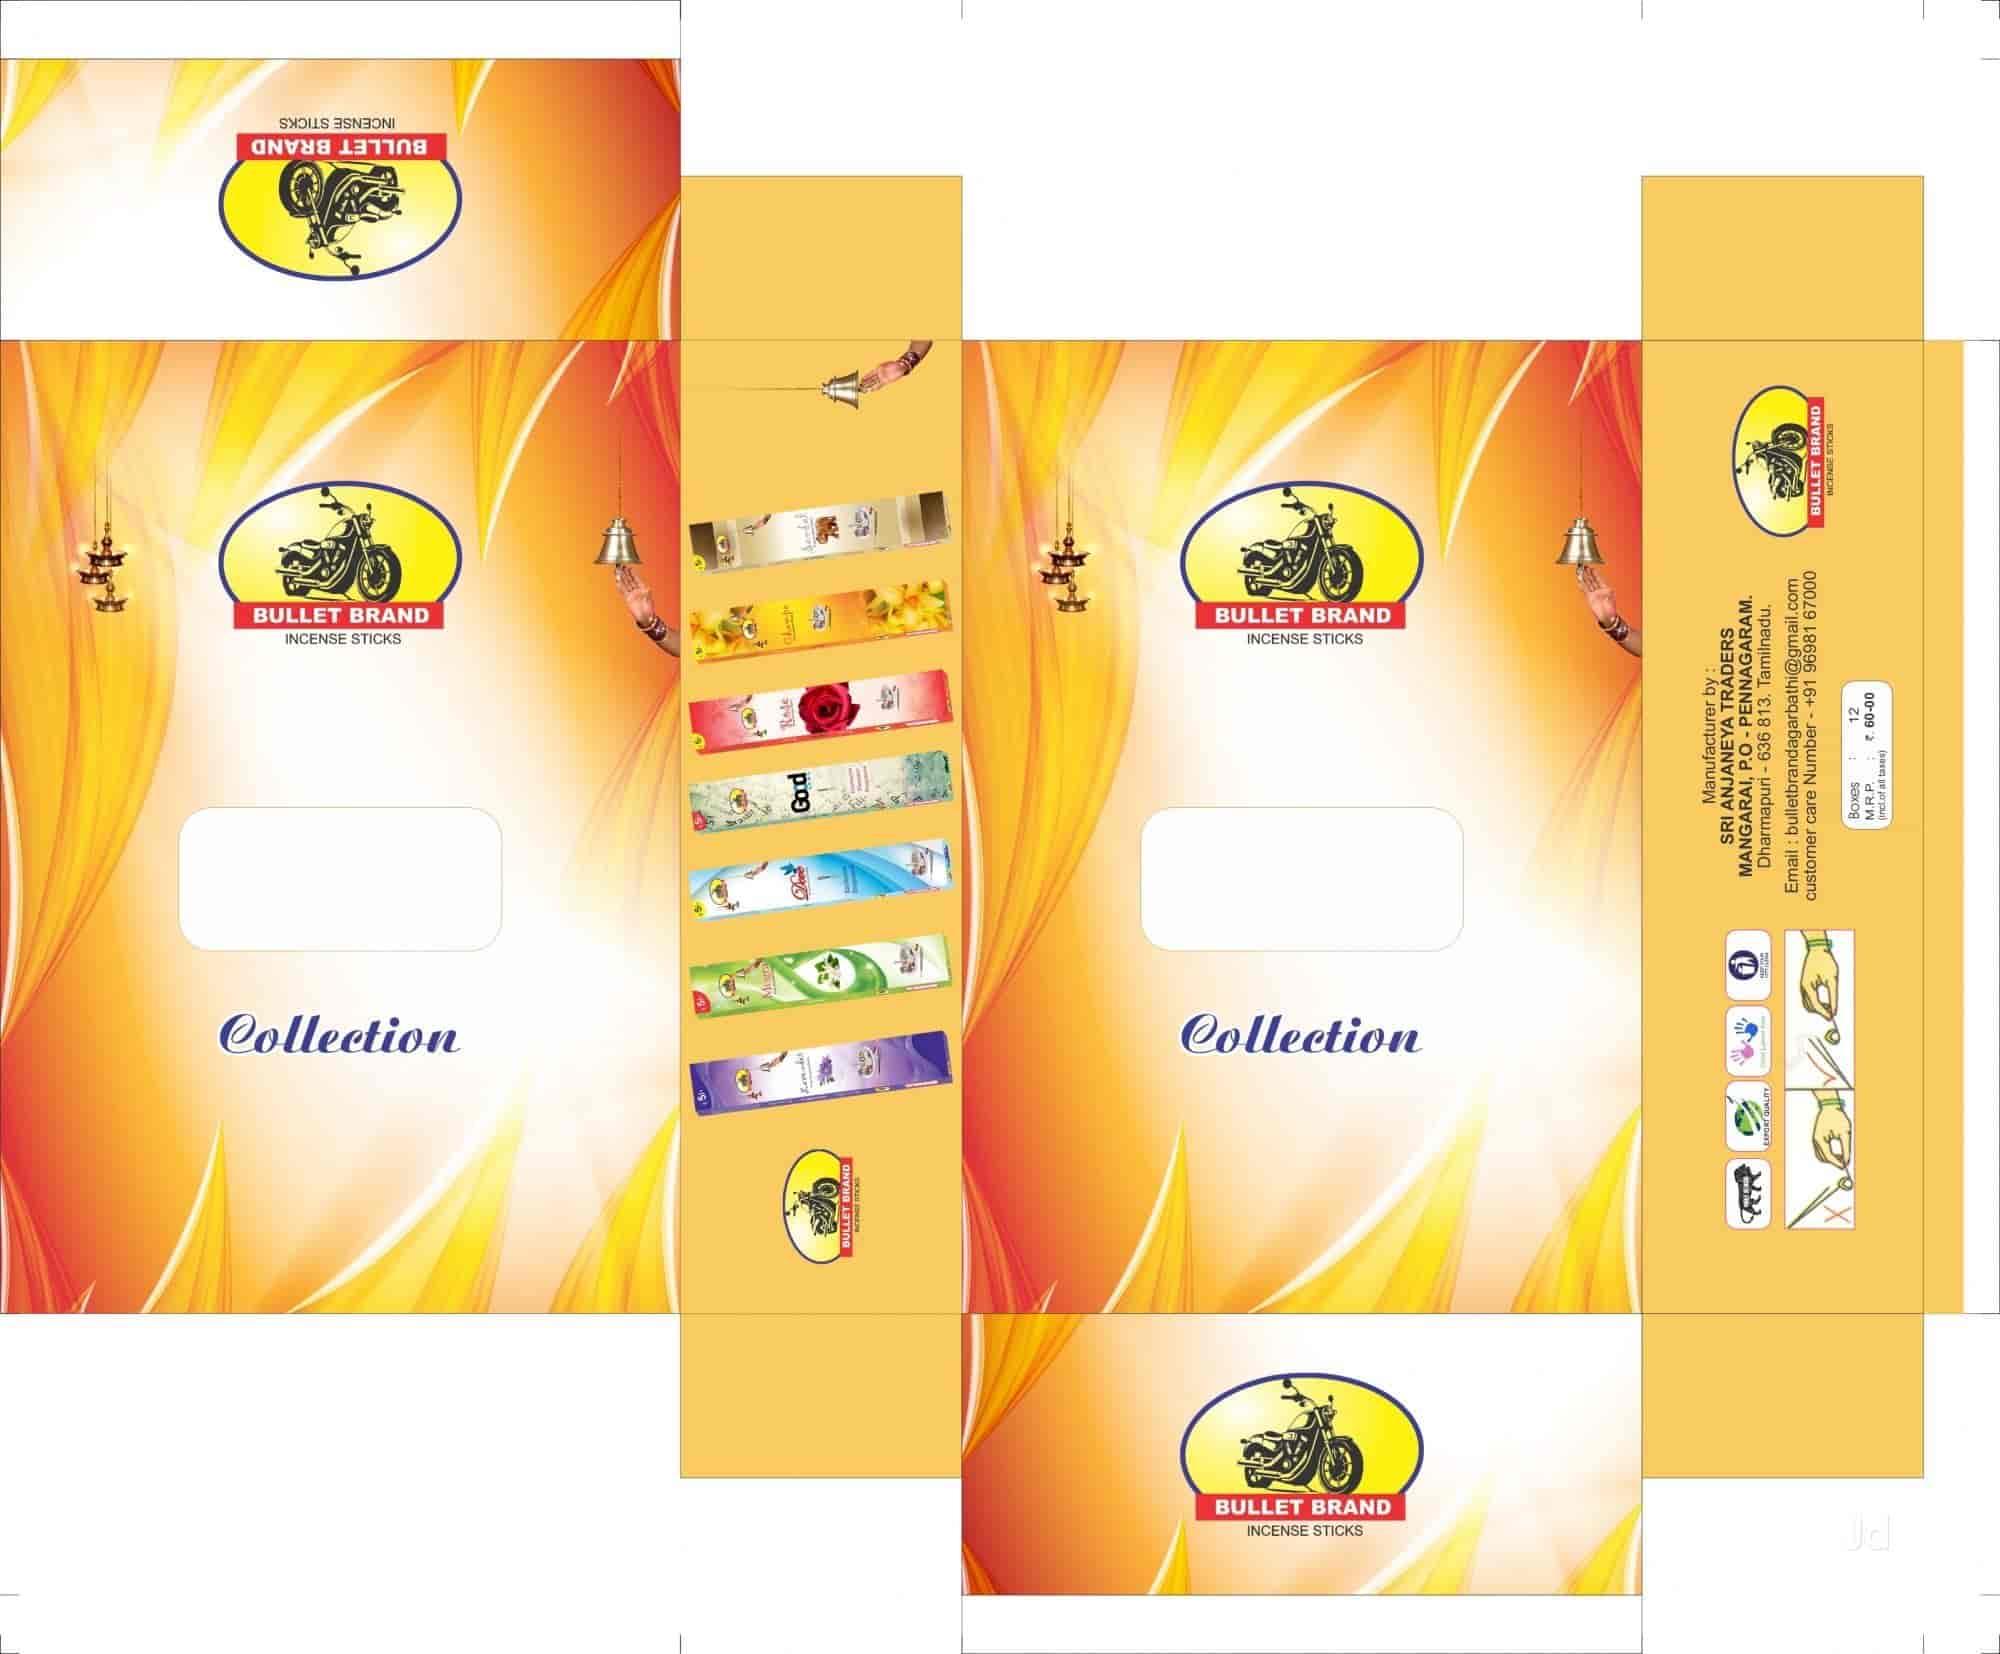 Bullet Brand Agarbathi, Pennagaram - Agarbatti Dealers in